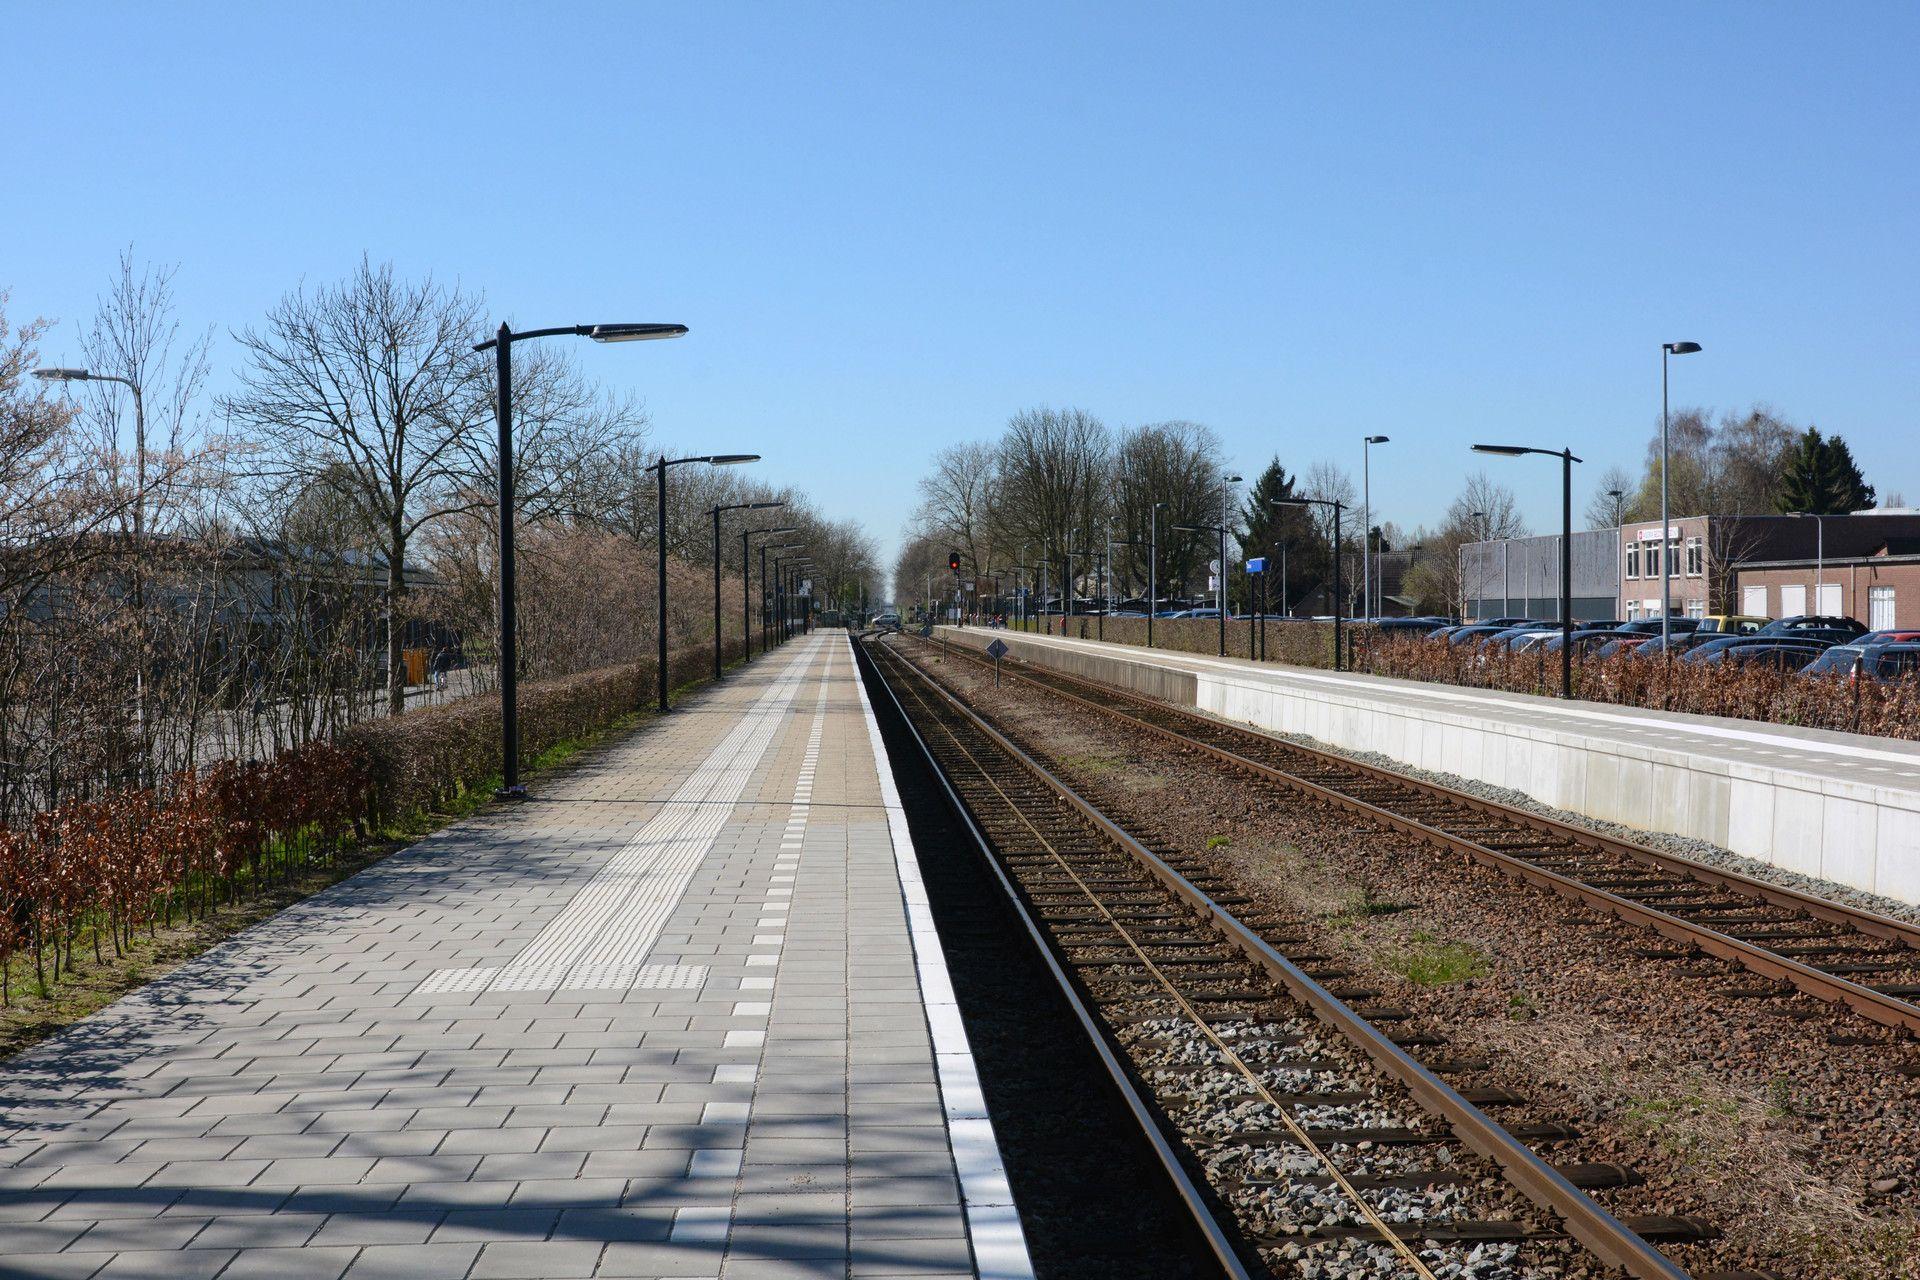 station Didam